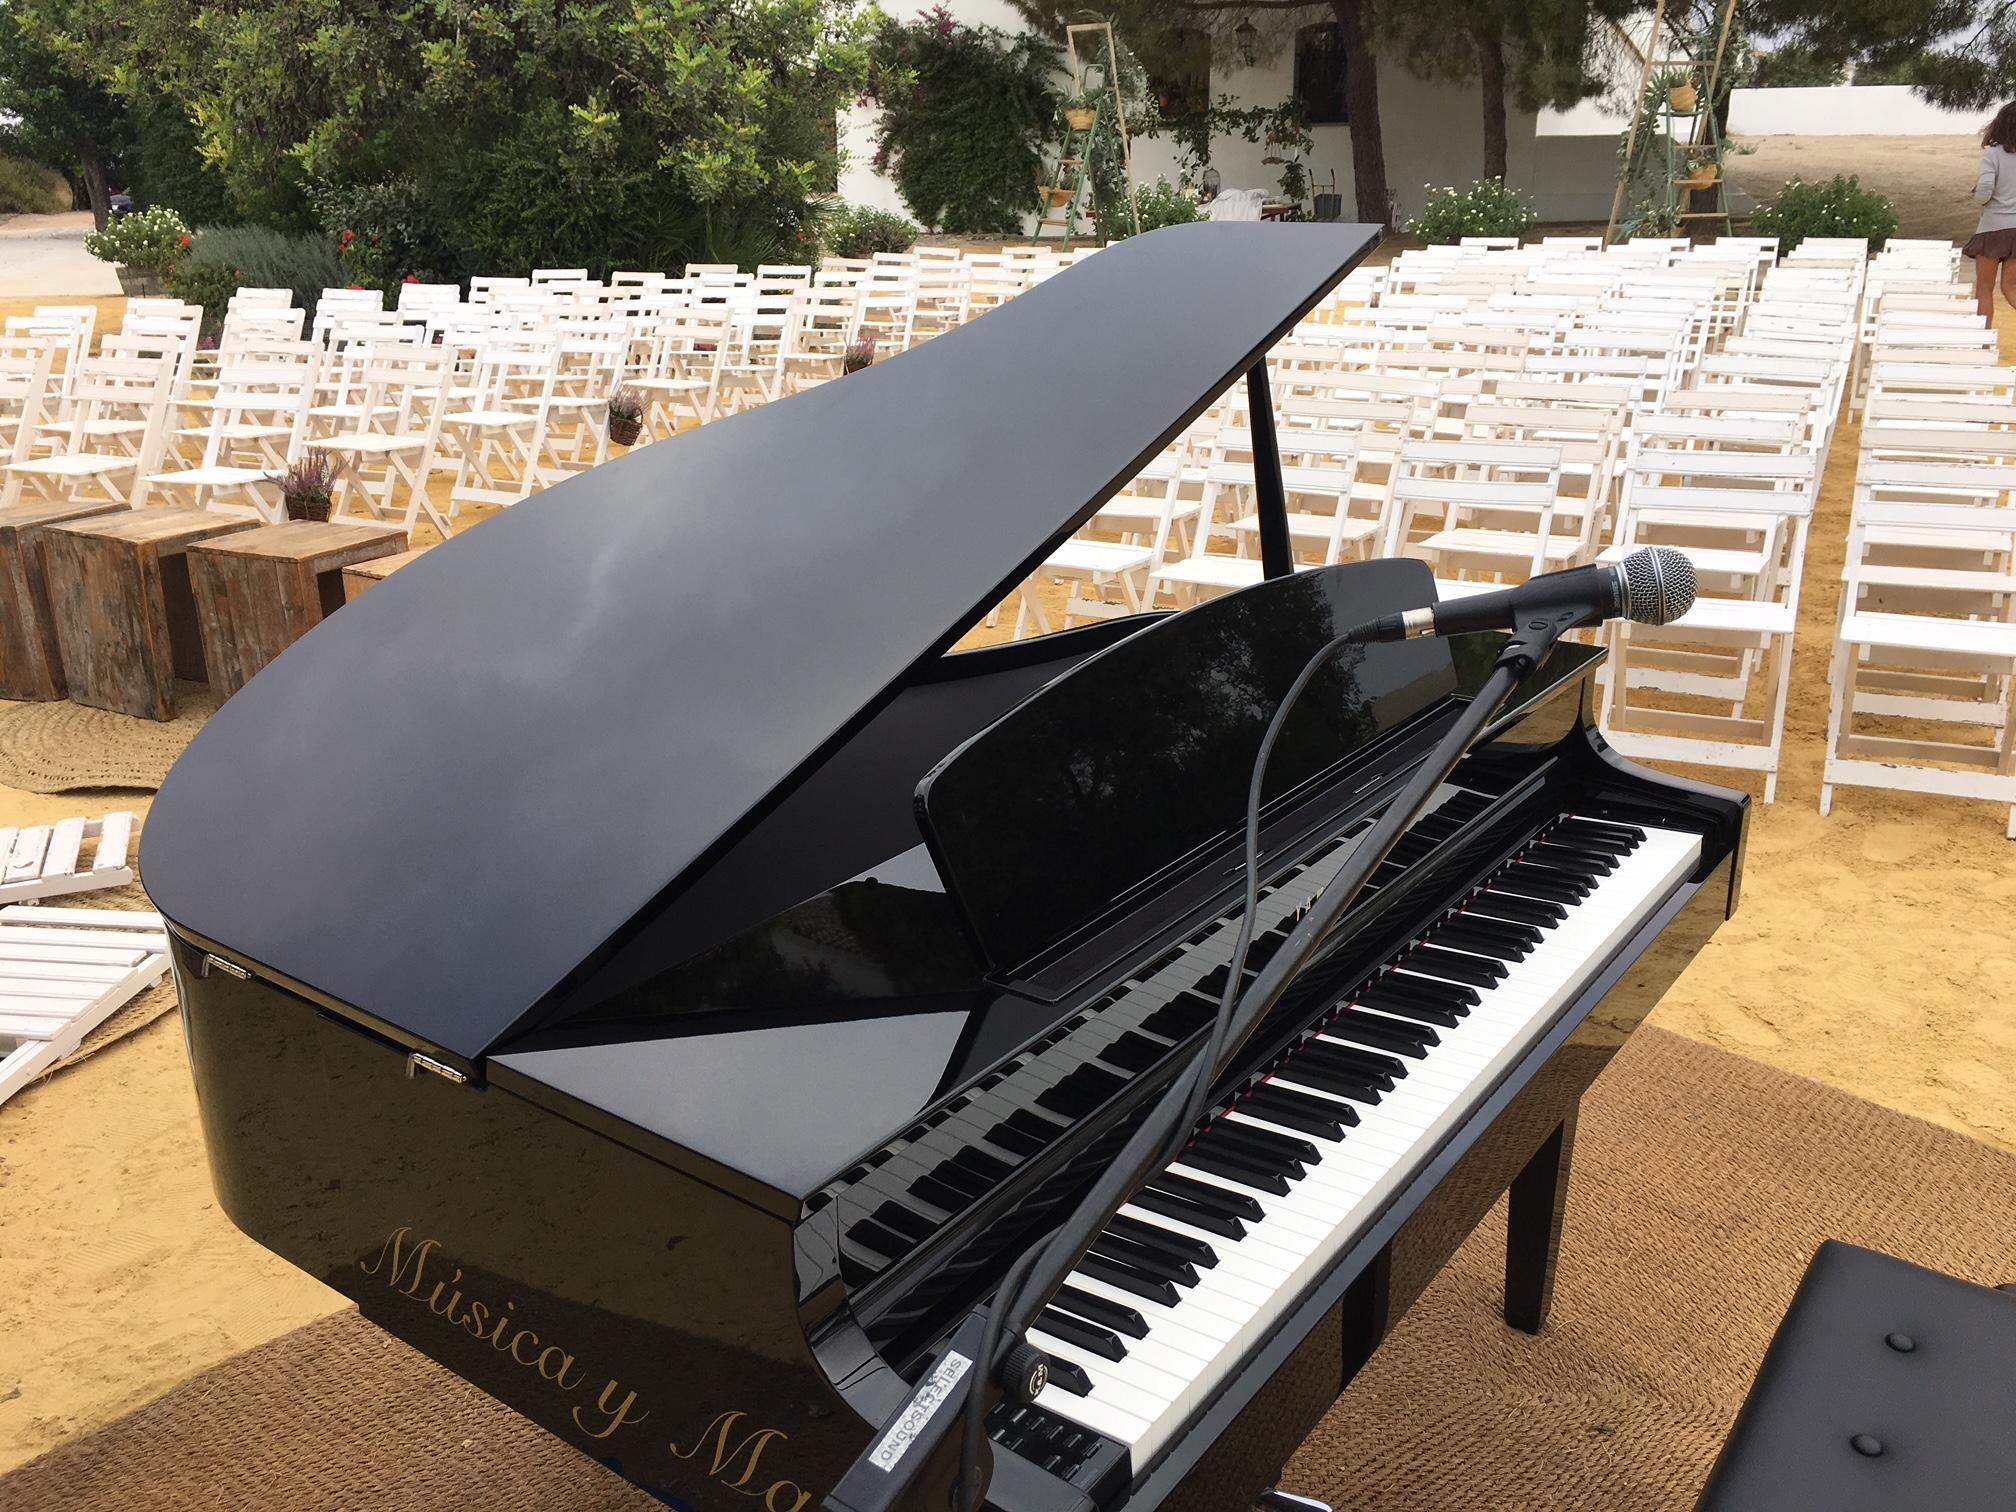 Alquiler de piano en Córdoba